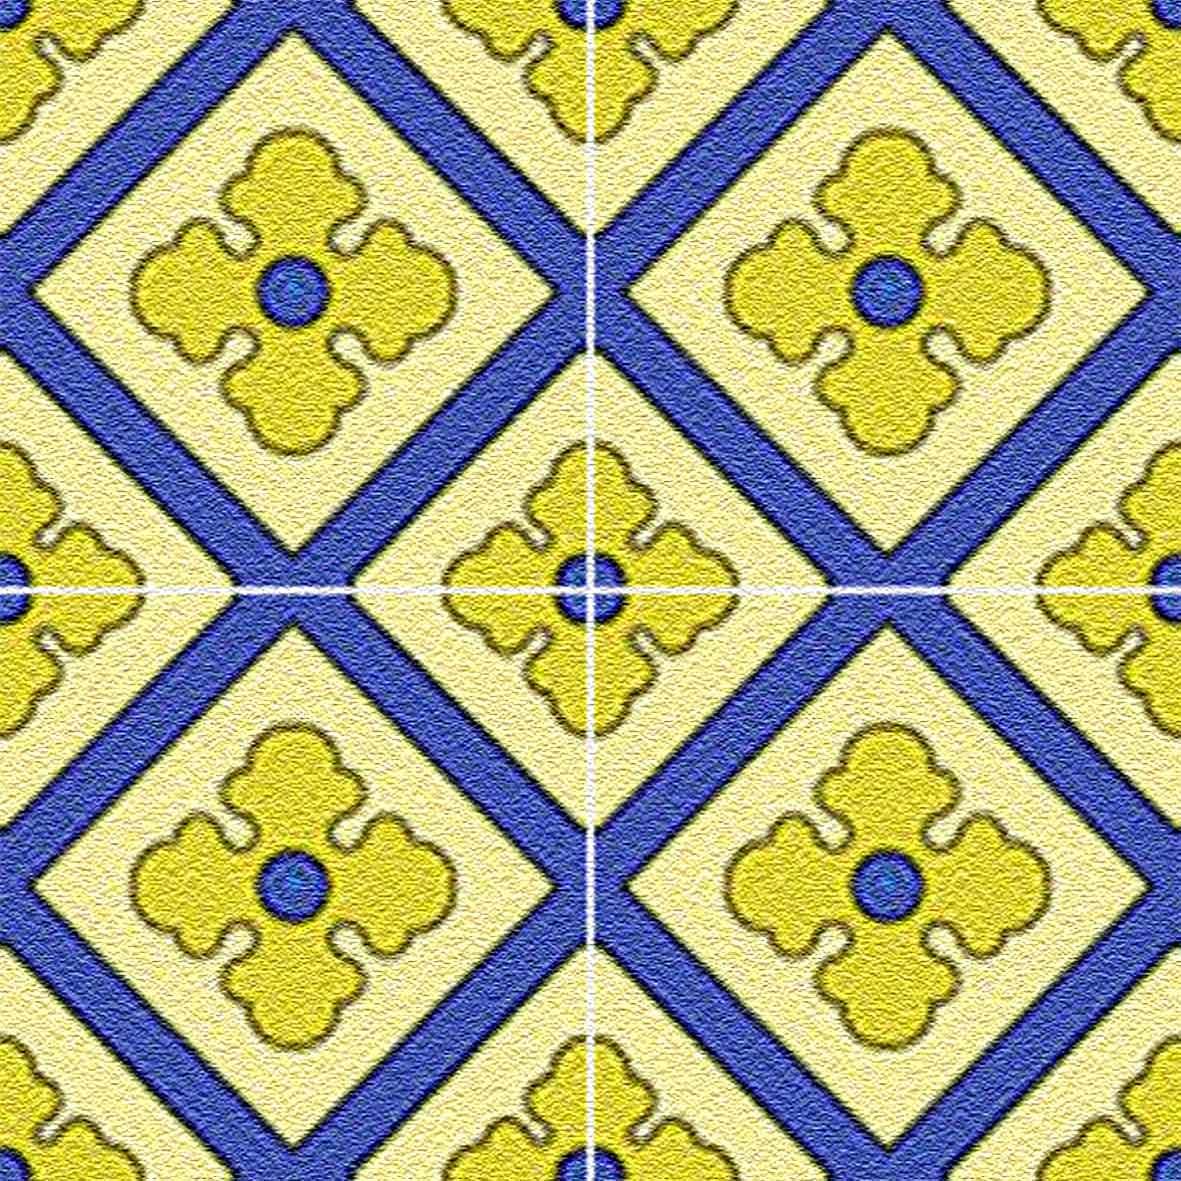 Adesivo para Azulejo Ladrilho Hidráulico Gijón Vinil 15x15cm 16 peças Cosi Dimora